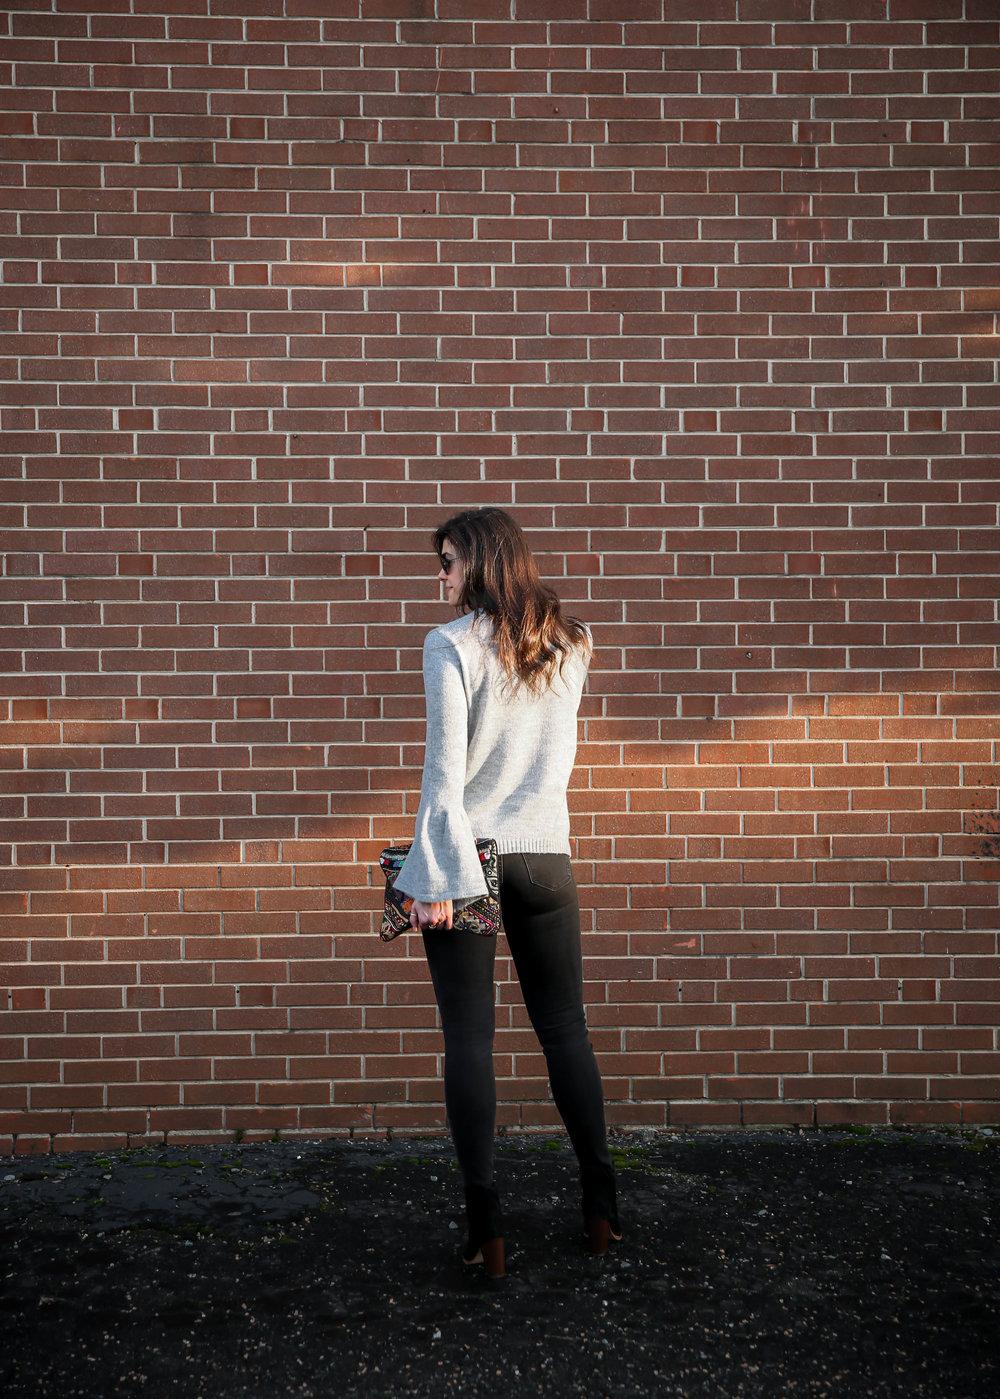 black-skinny-jeans-grey-sweater-lauren-schwaiger-style-blog.jpg